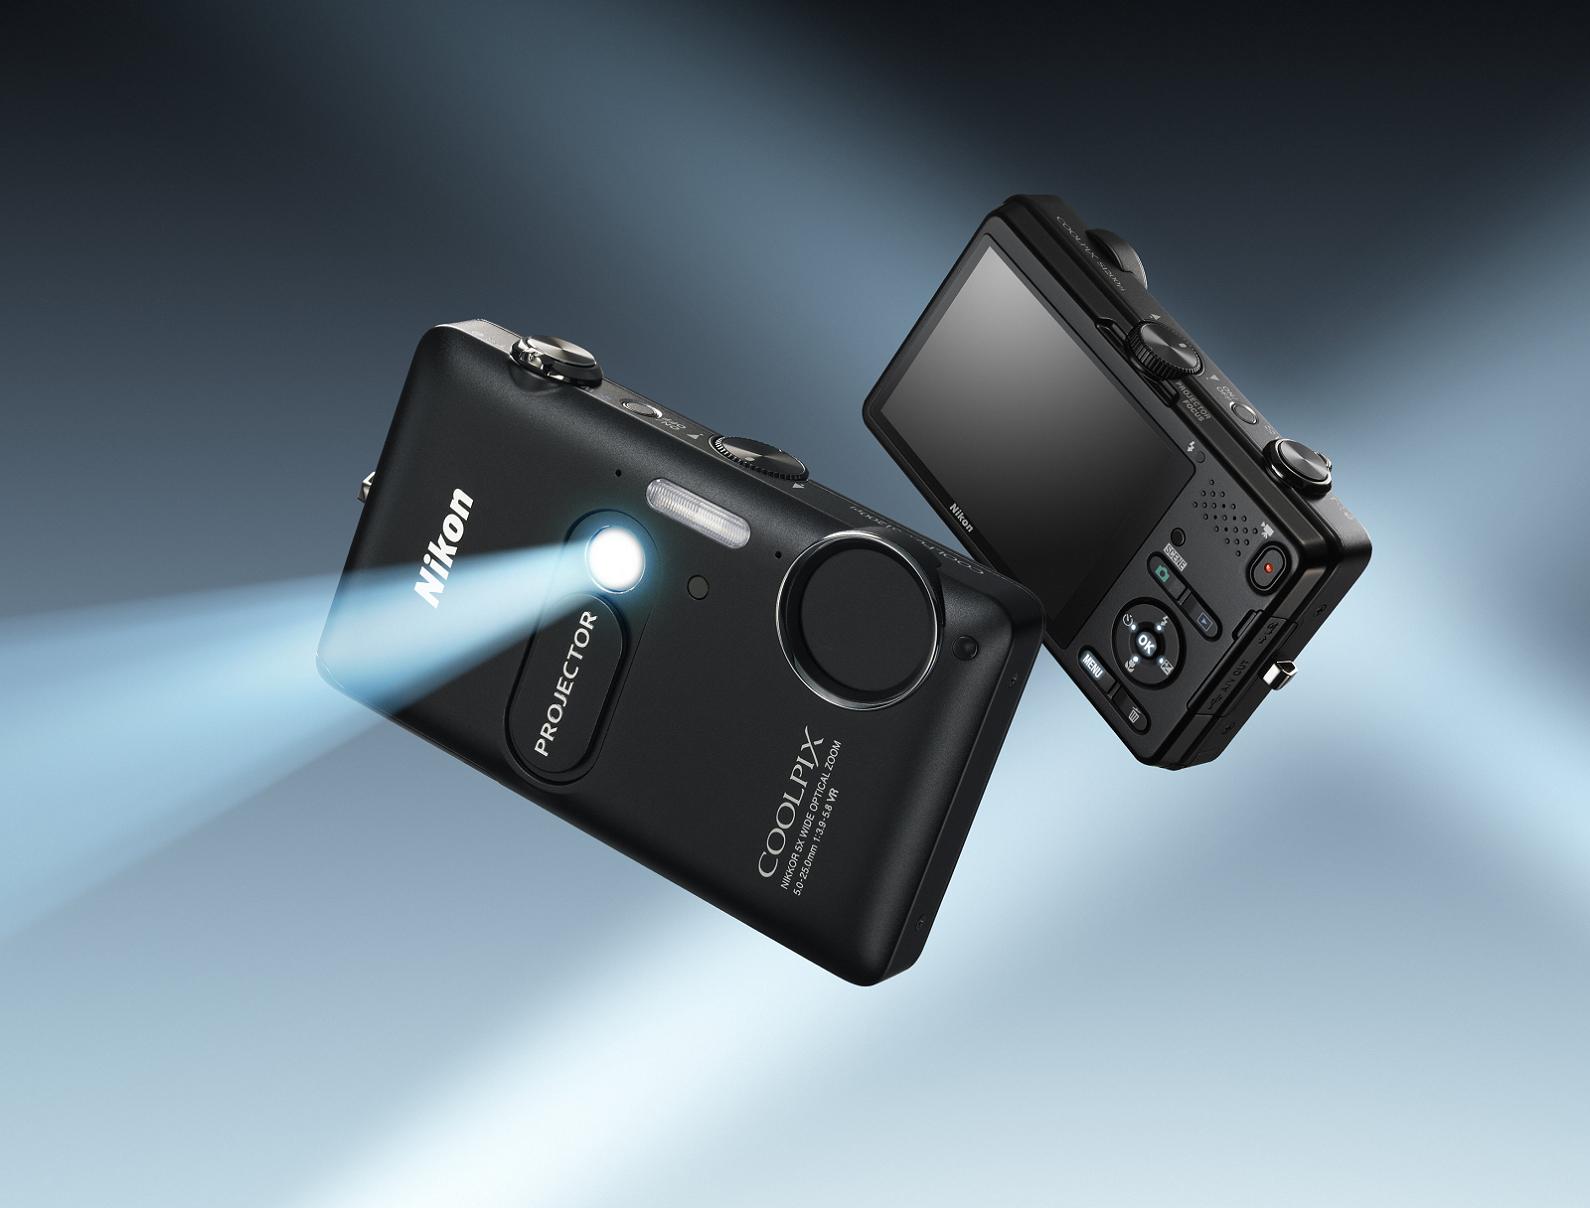 آموزش دوربین نیکون Coolpix S1200pj